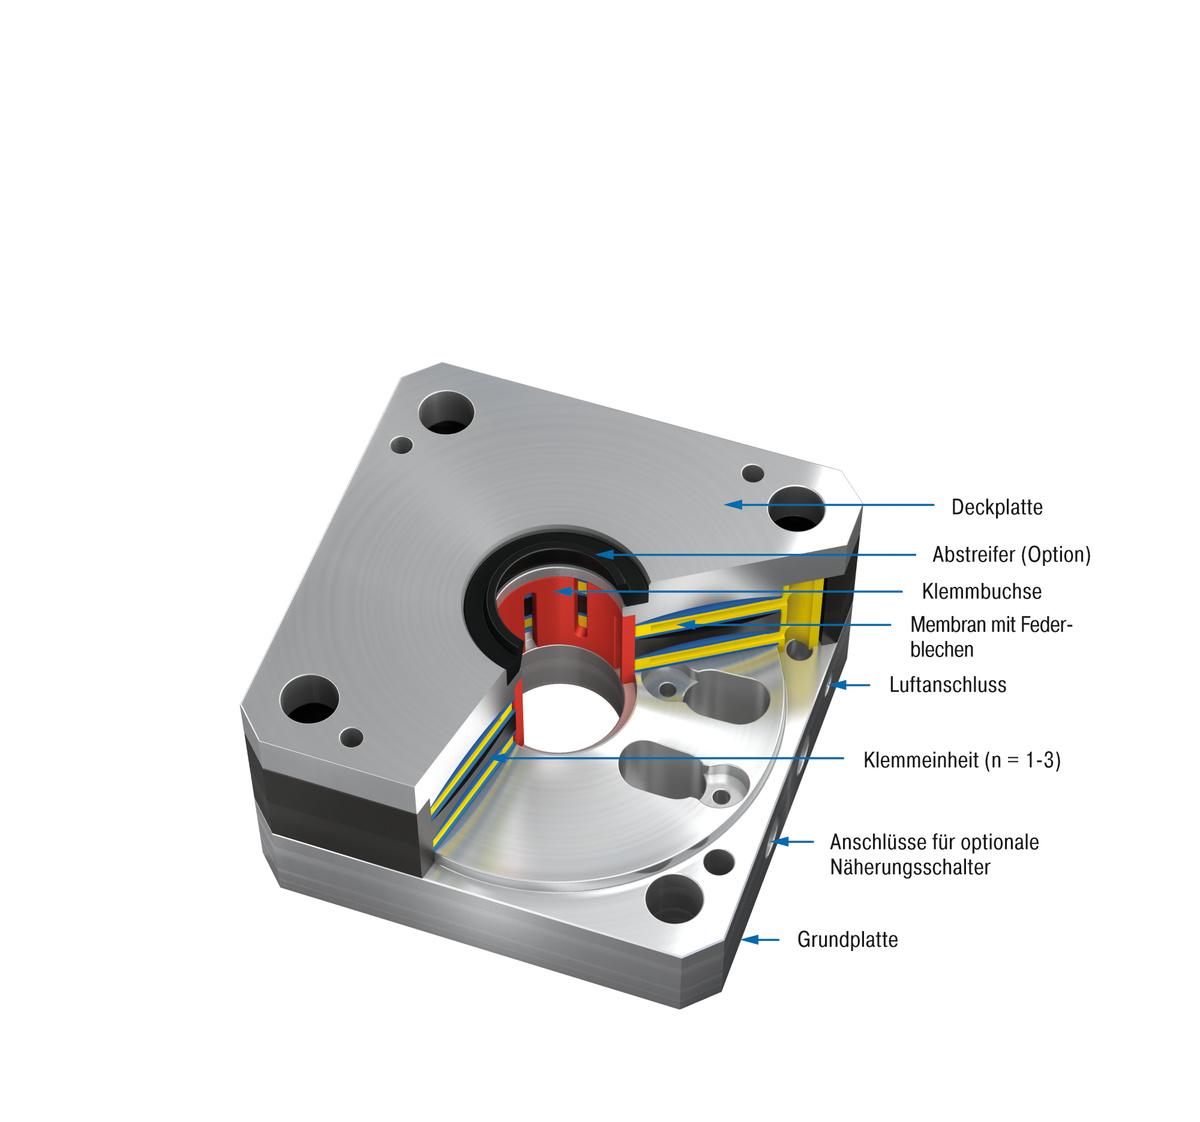 ACE Stoßdämpfer GmbH - Bild - LOCKED PN